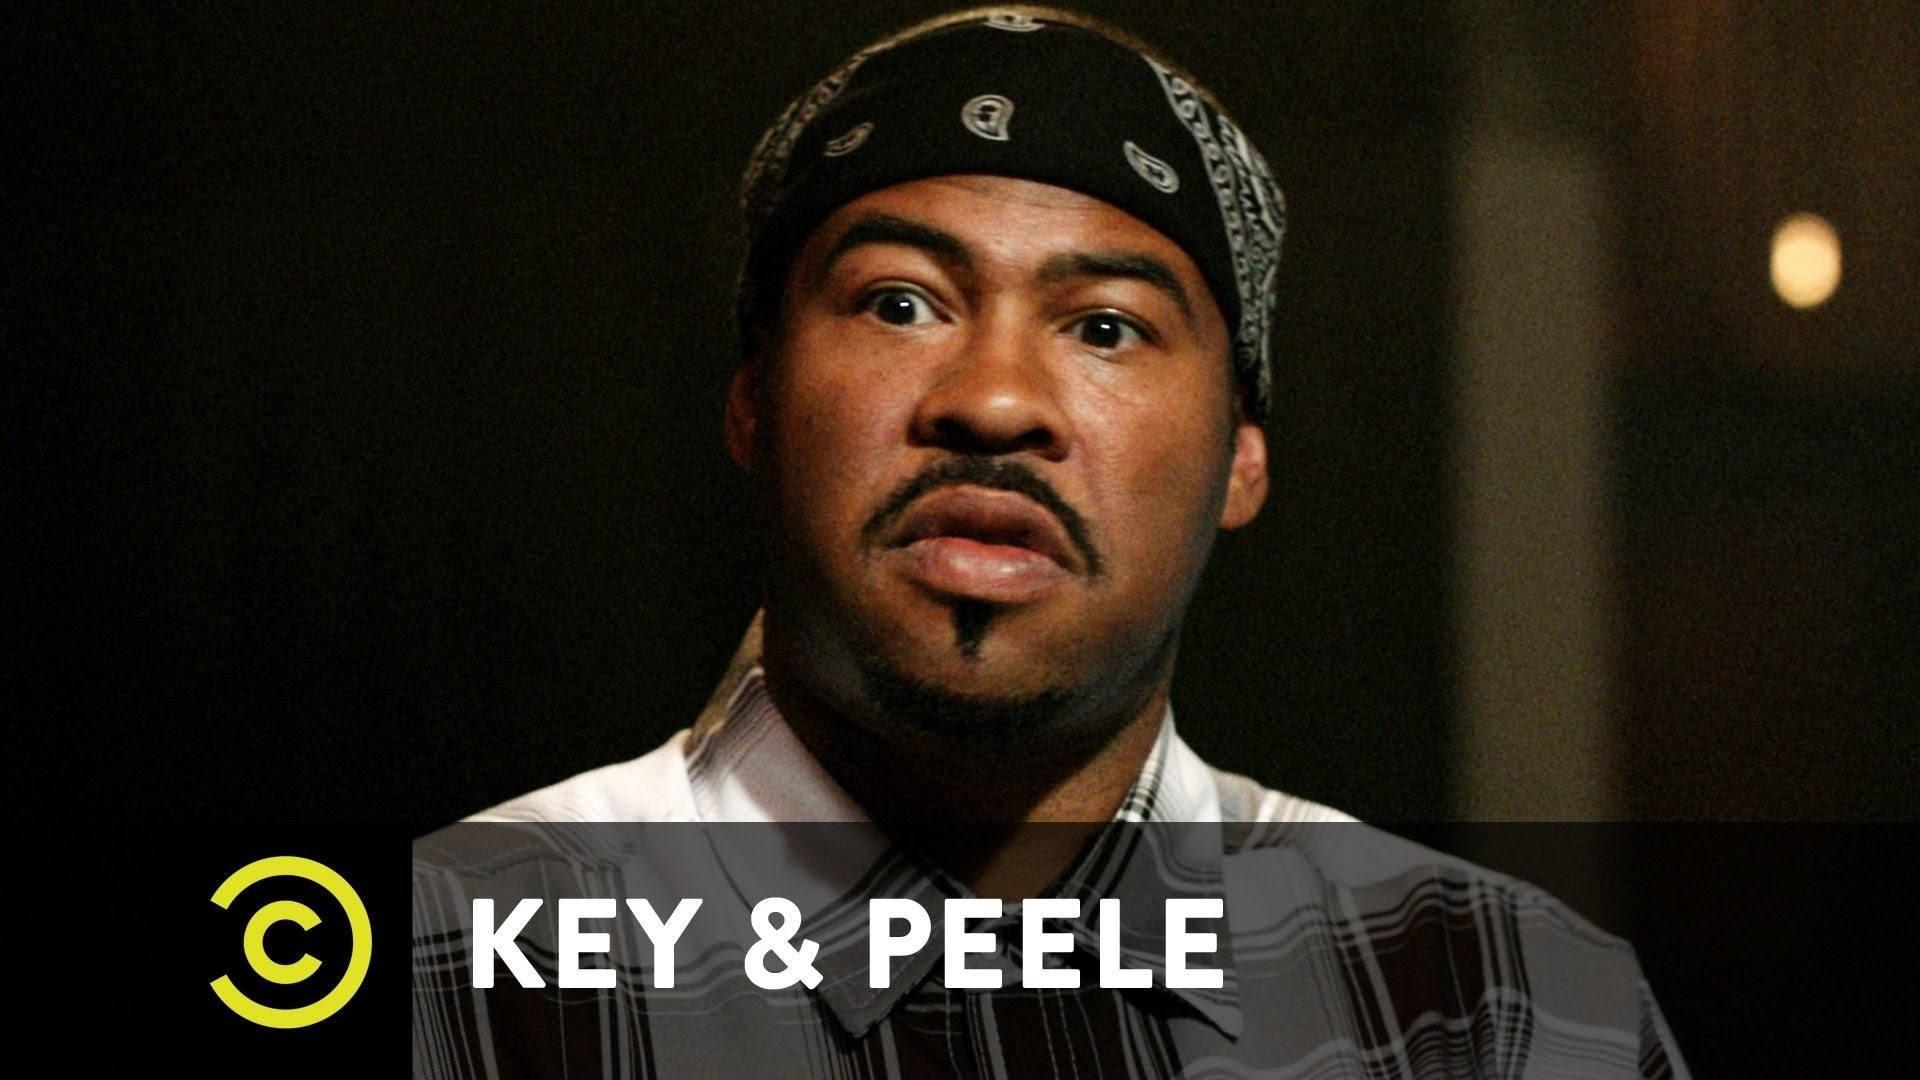 20 Of The Absolute Funniest Key & Peele Videos